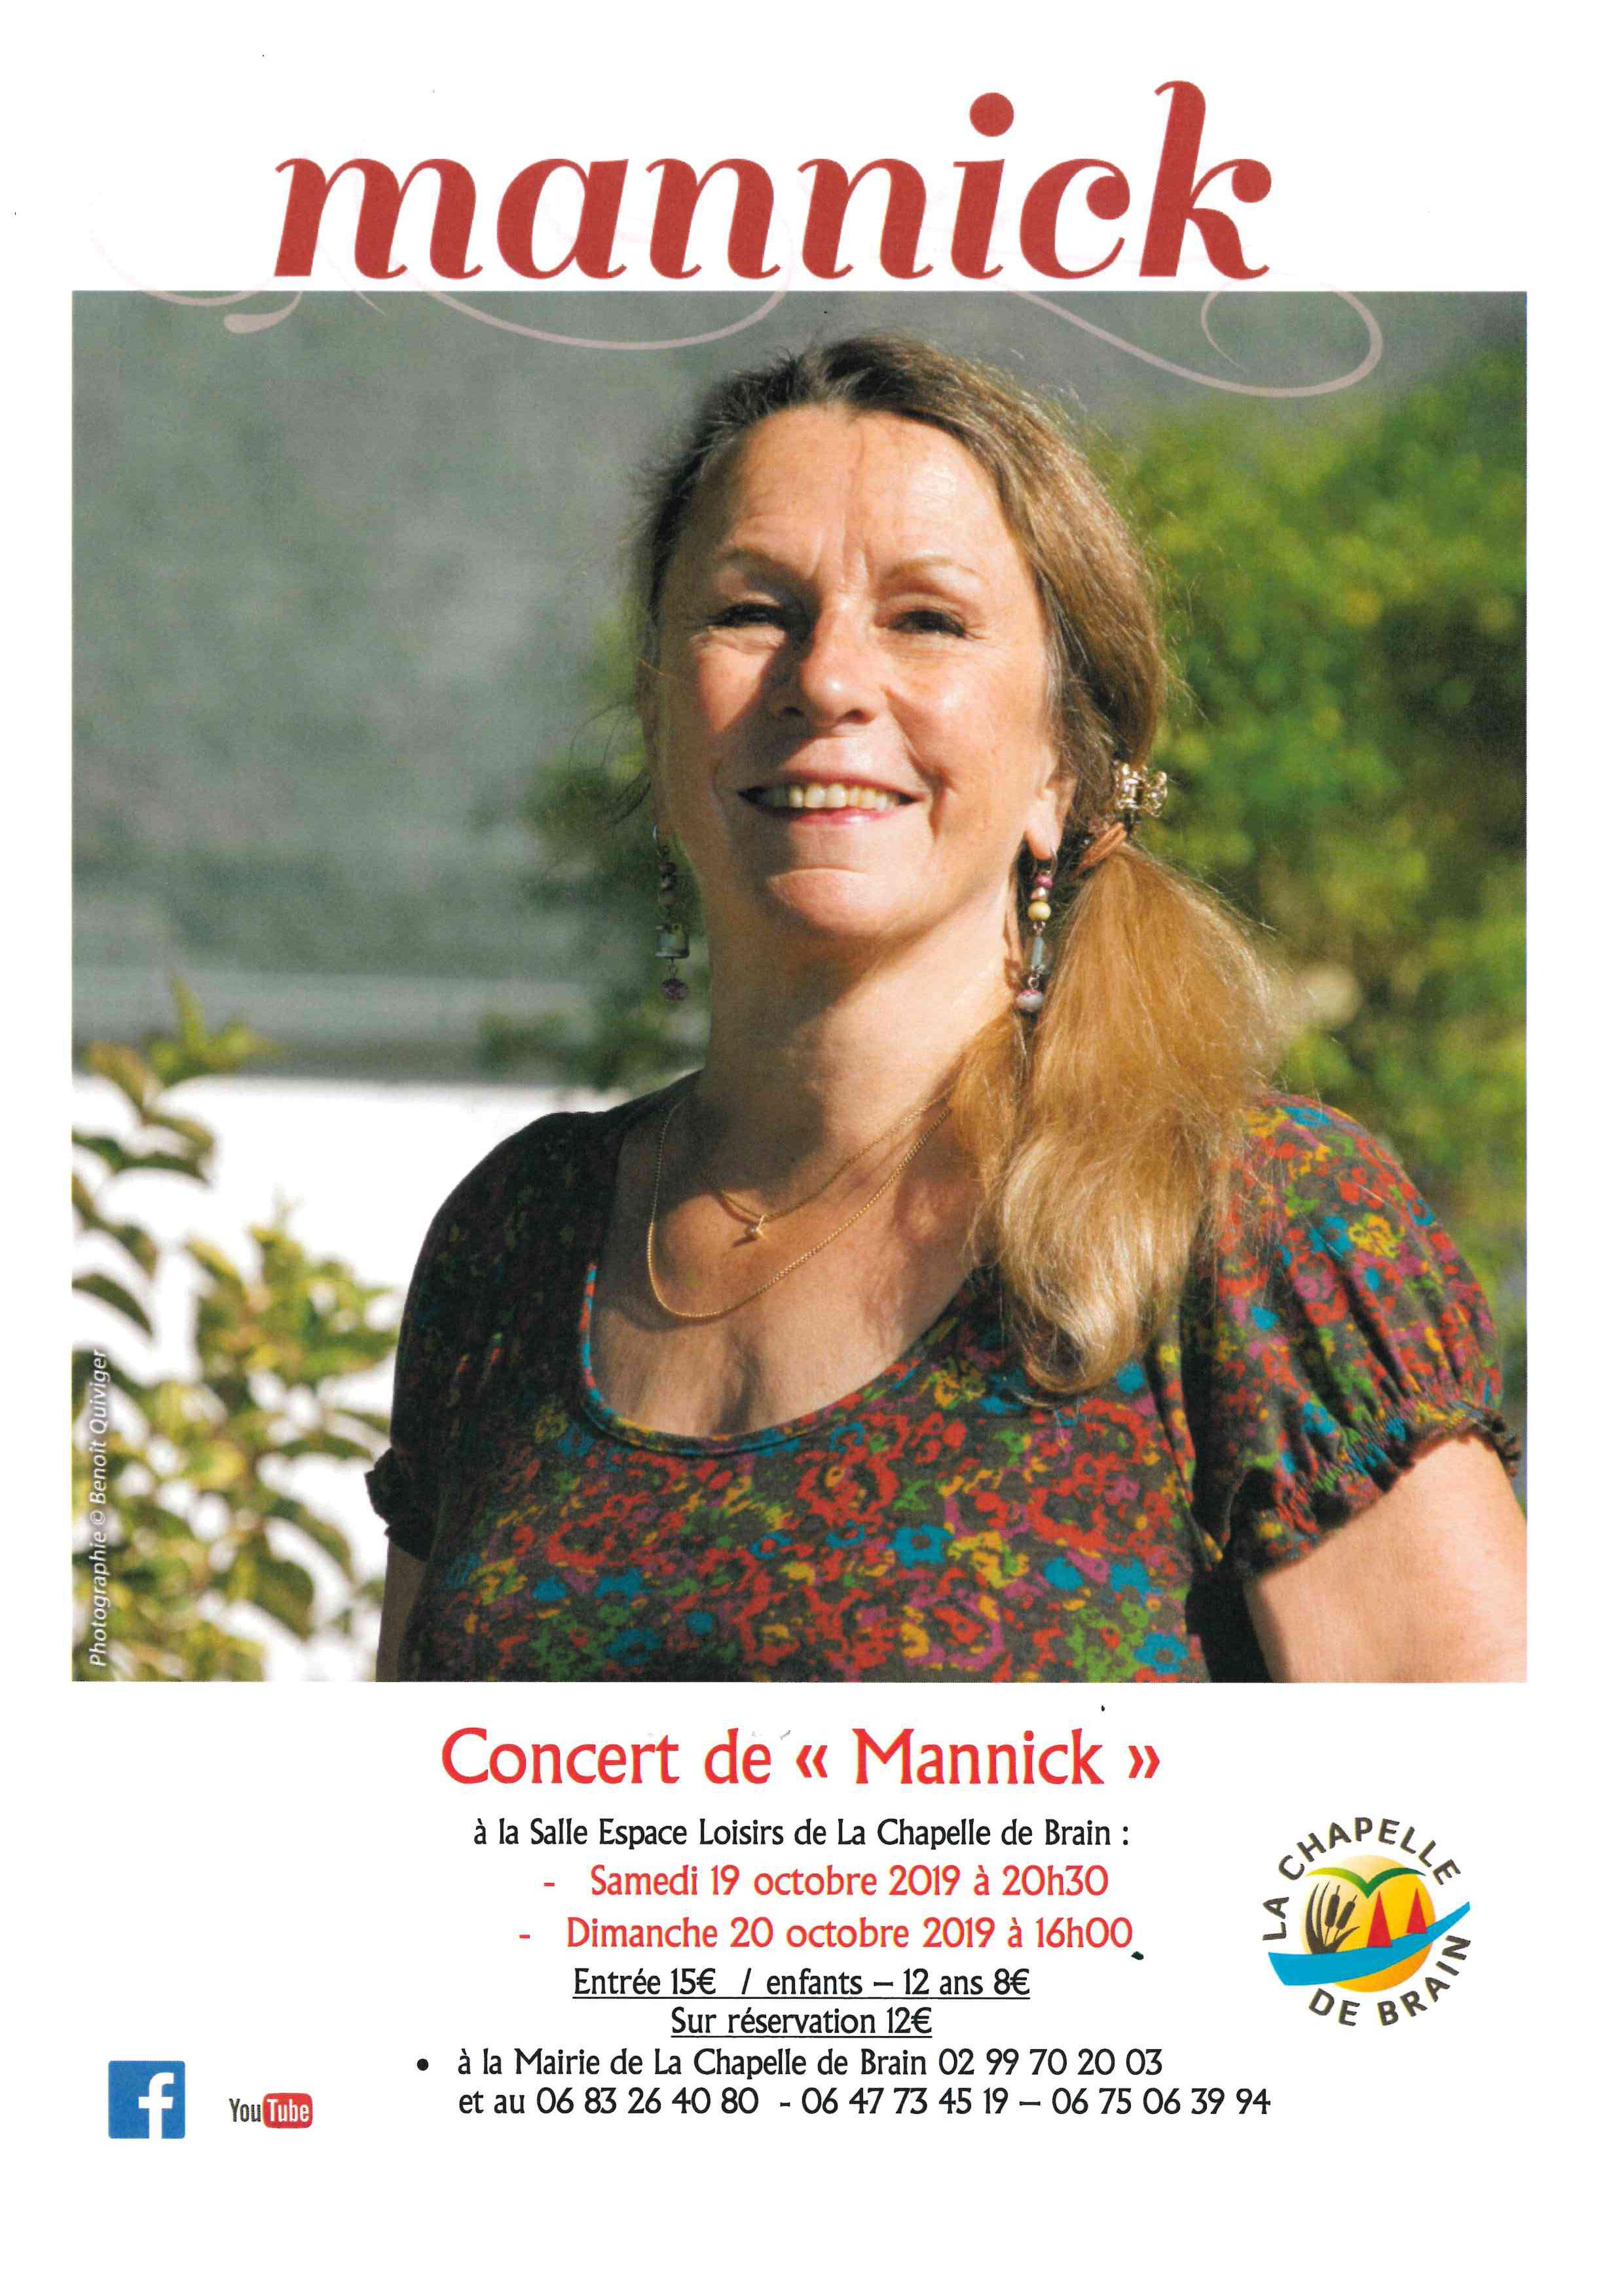 Concert de Mannick ...